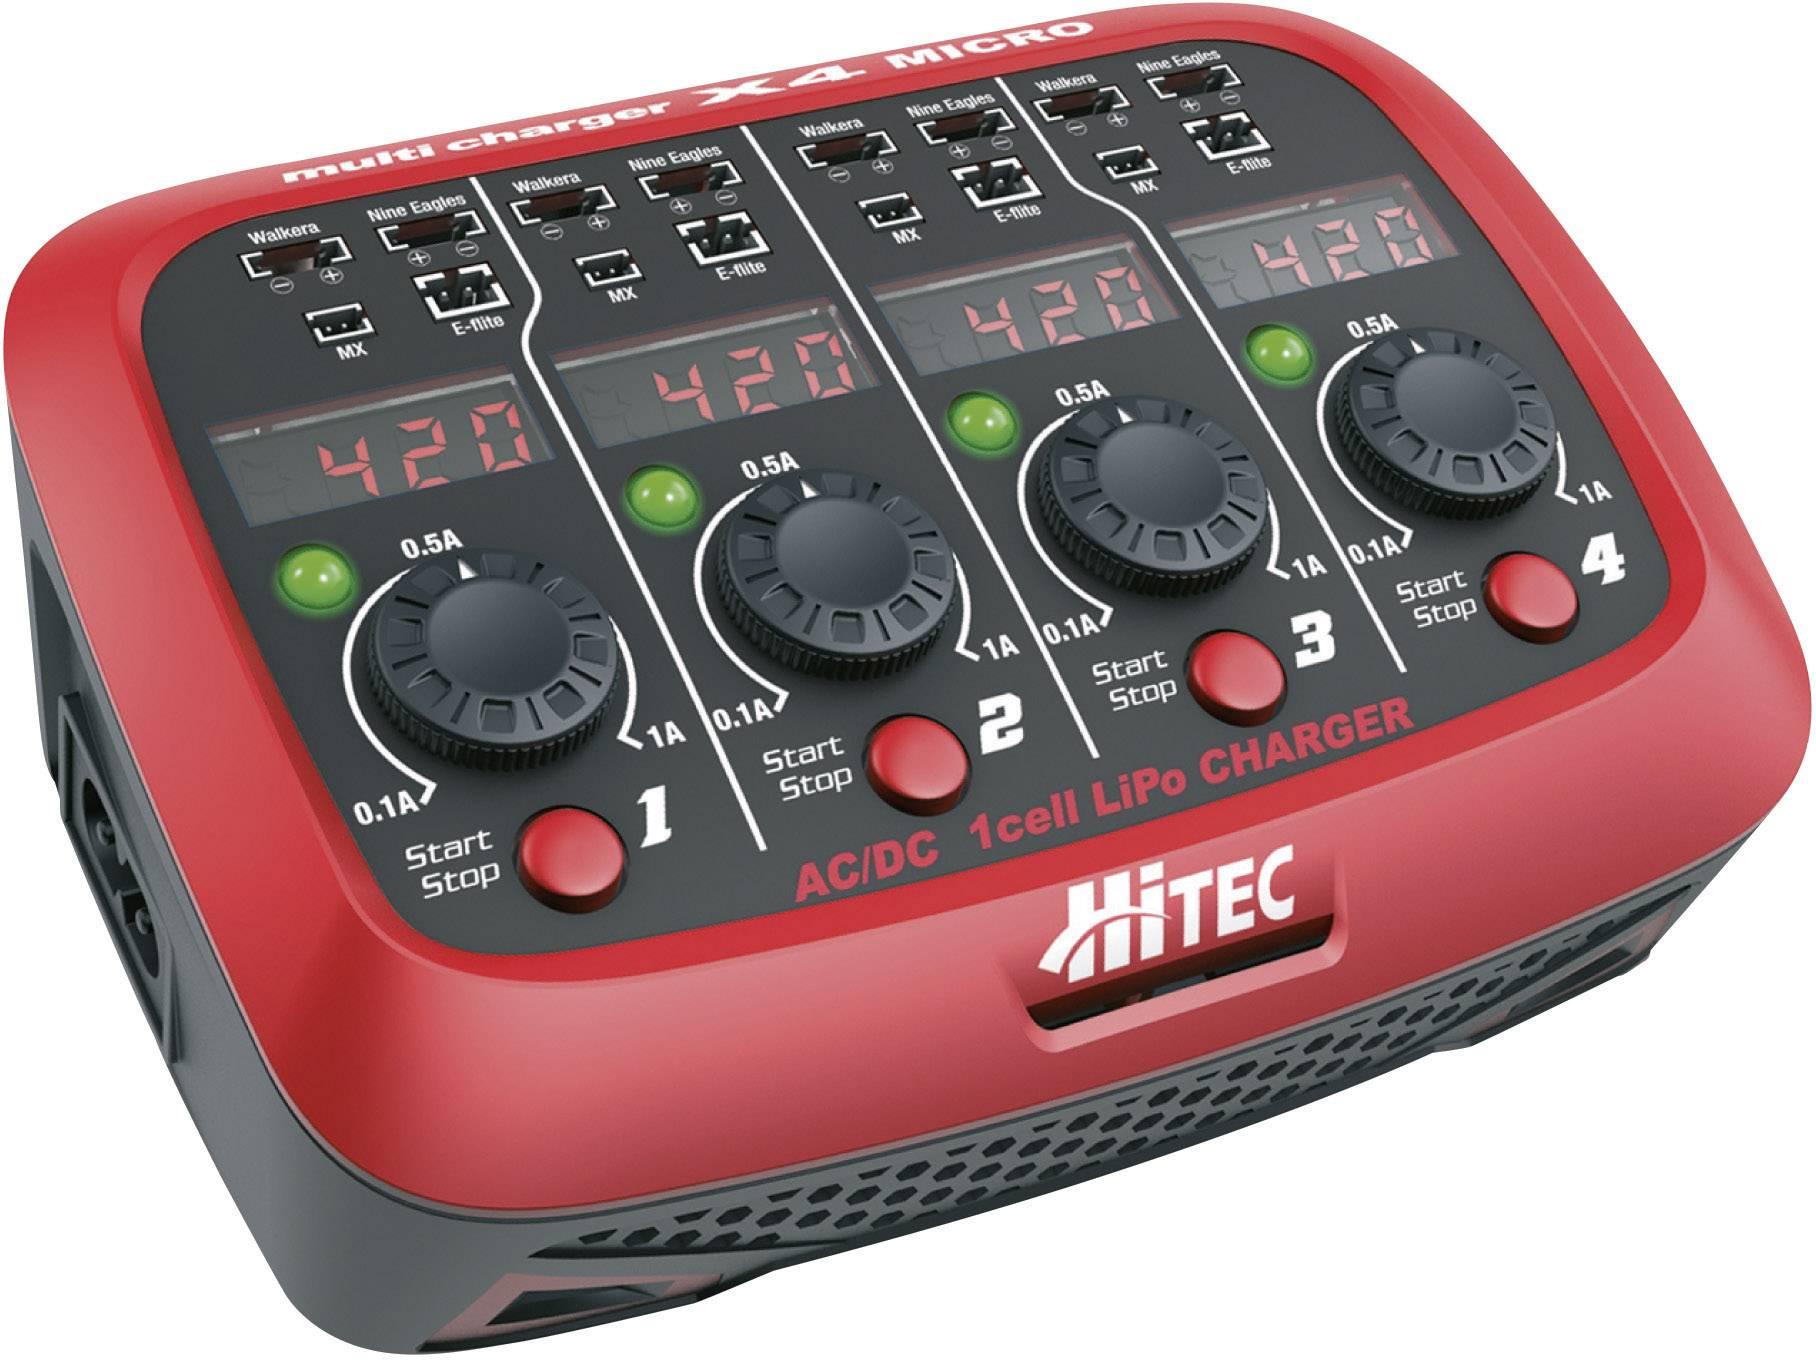 Modelárska nabíjačka Hitec X4 Micro 114123, 110 V, 220 V, 1 A